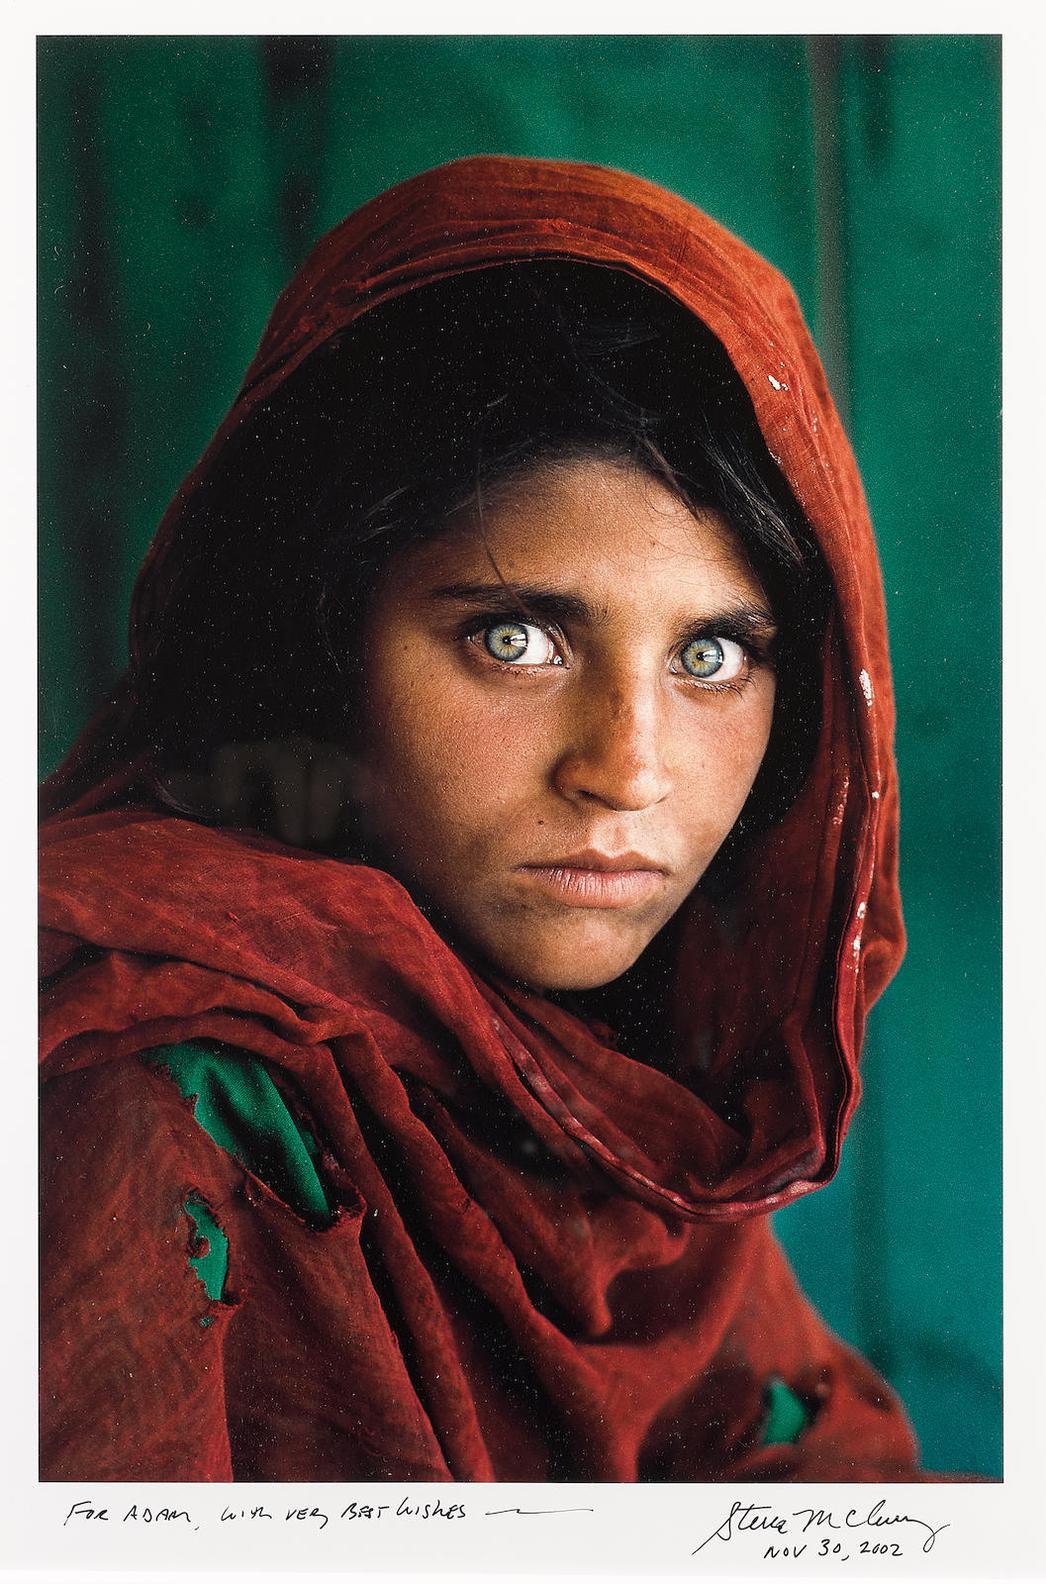 Steve McCurry-Sharbat Gula, Afghan Girl, Pakistan-1984